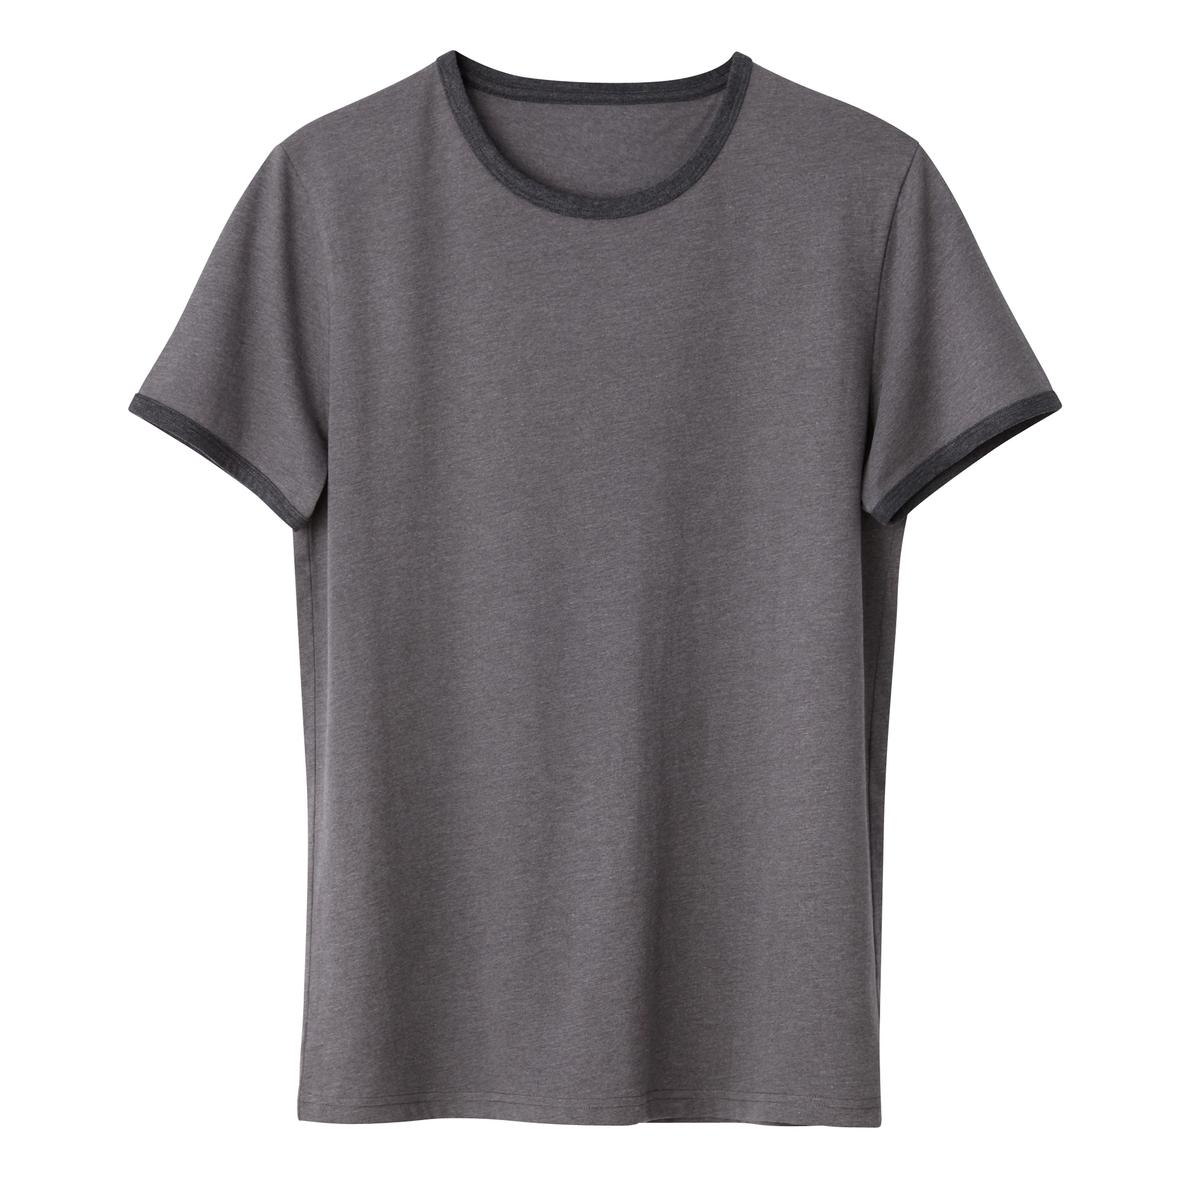 Кардиган  серый меланж цвета